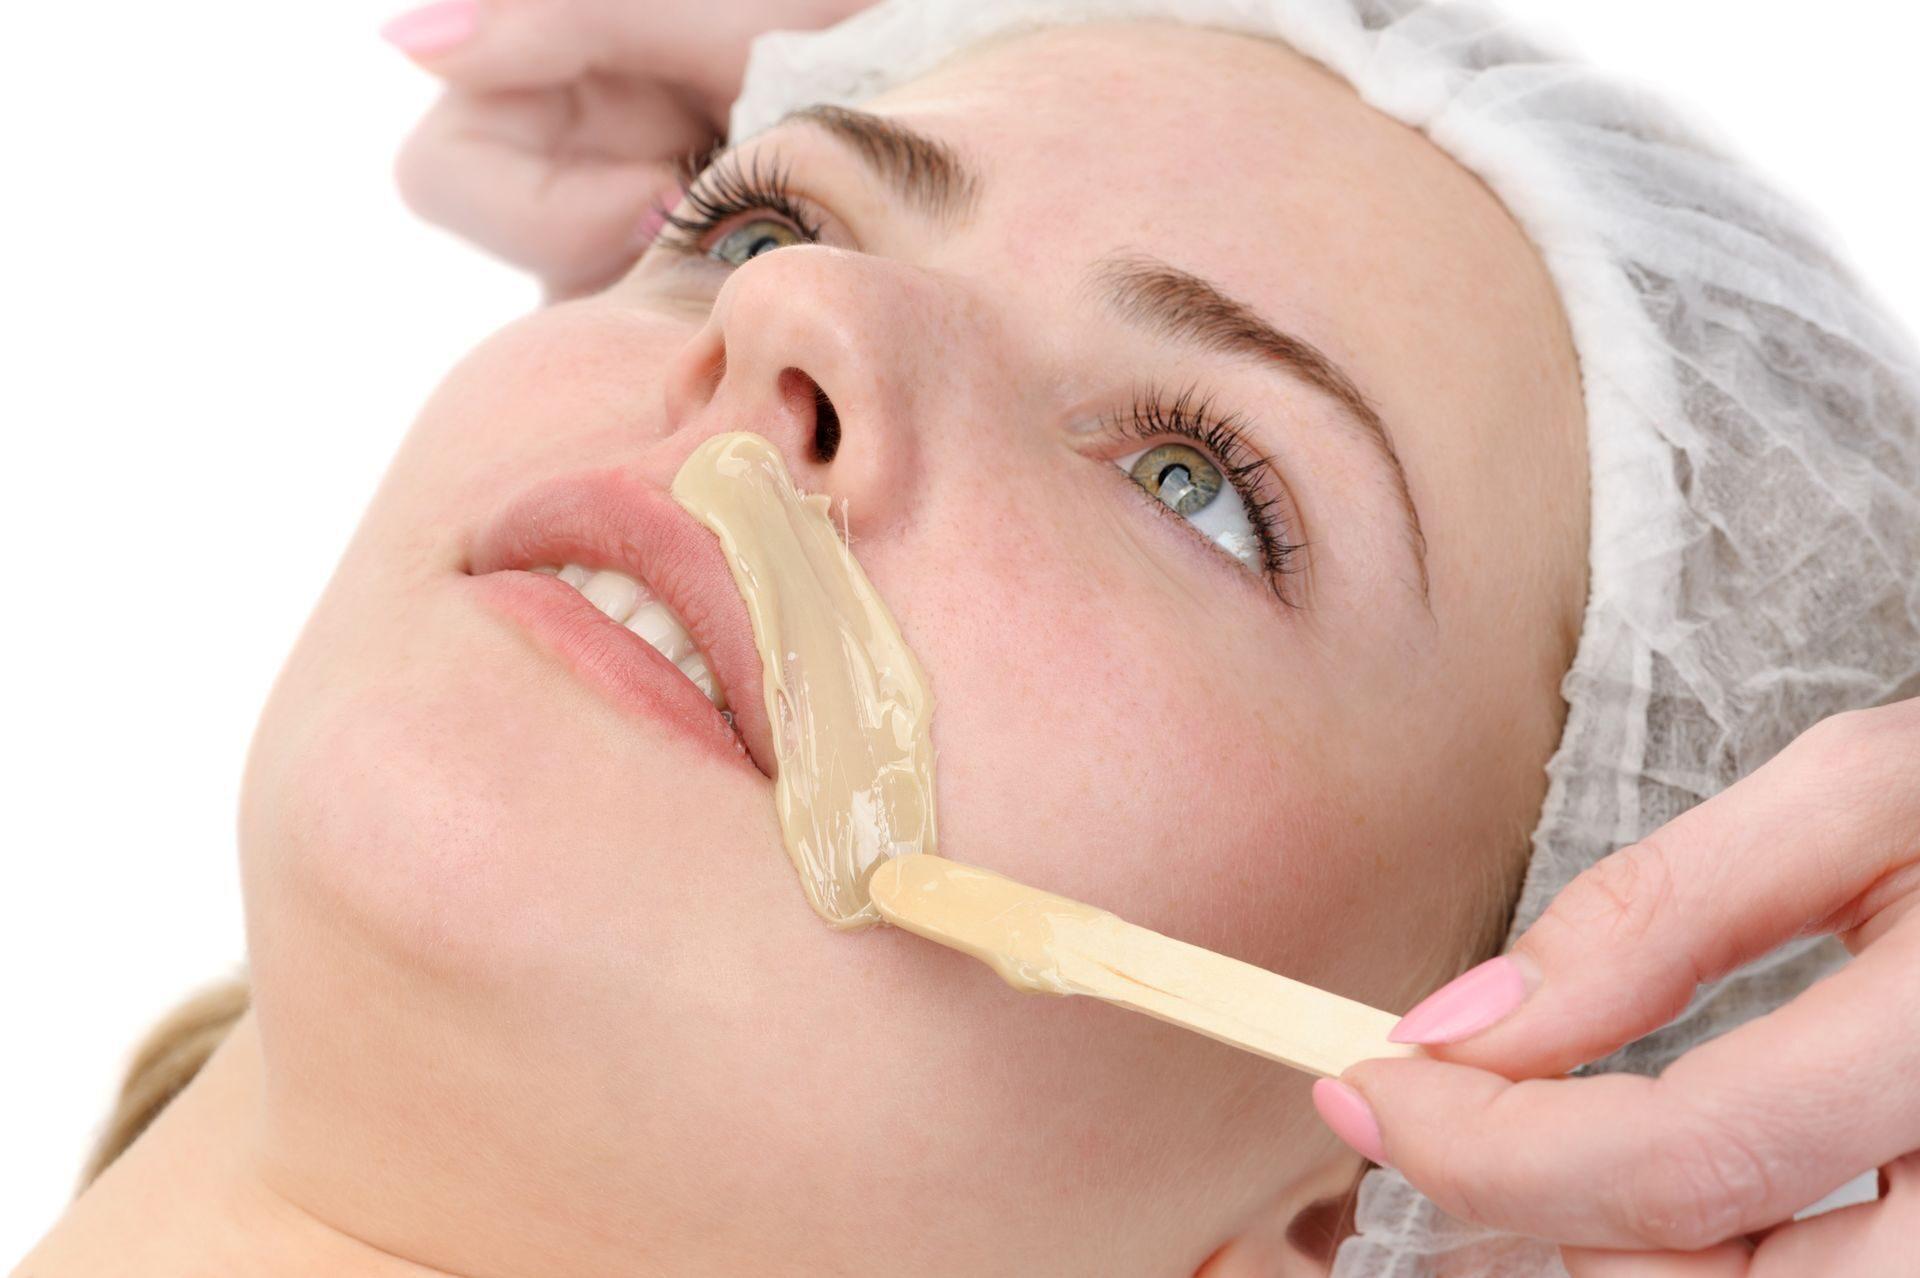 Free gargle deepthroat videos